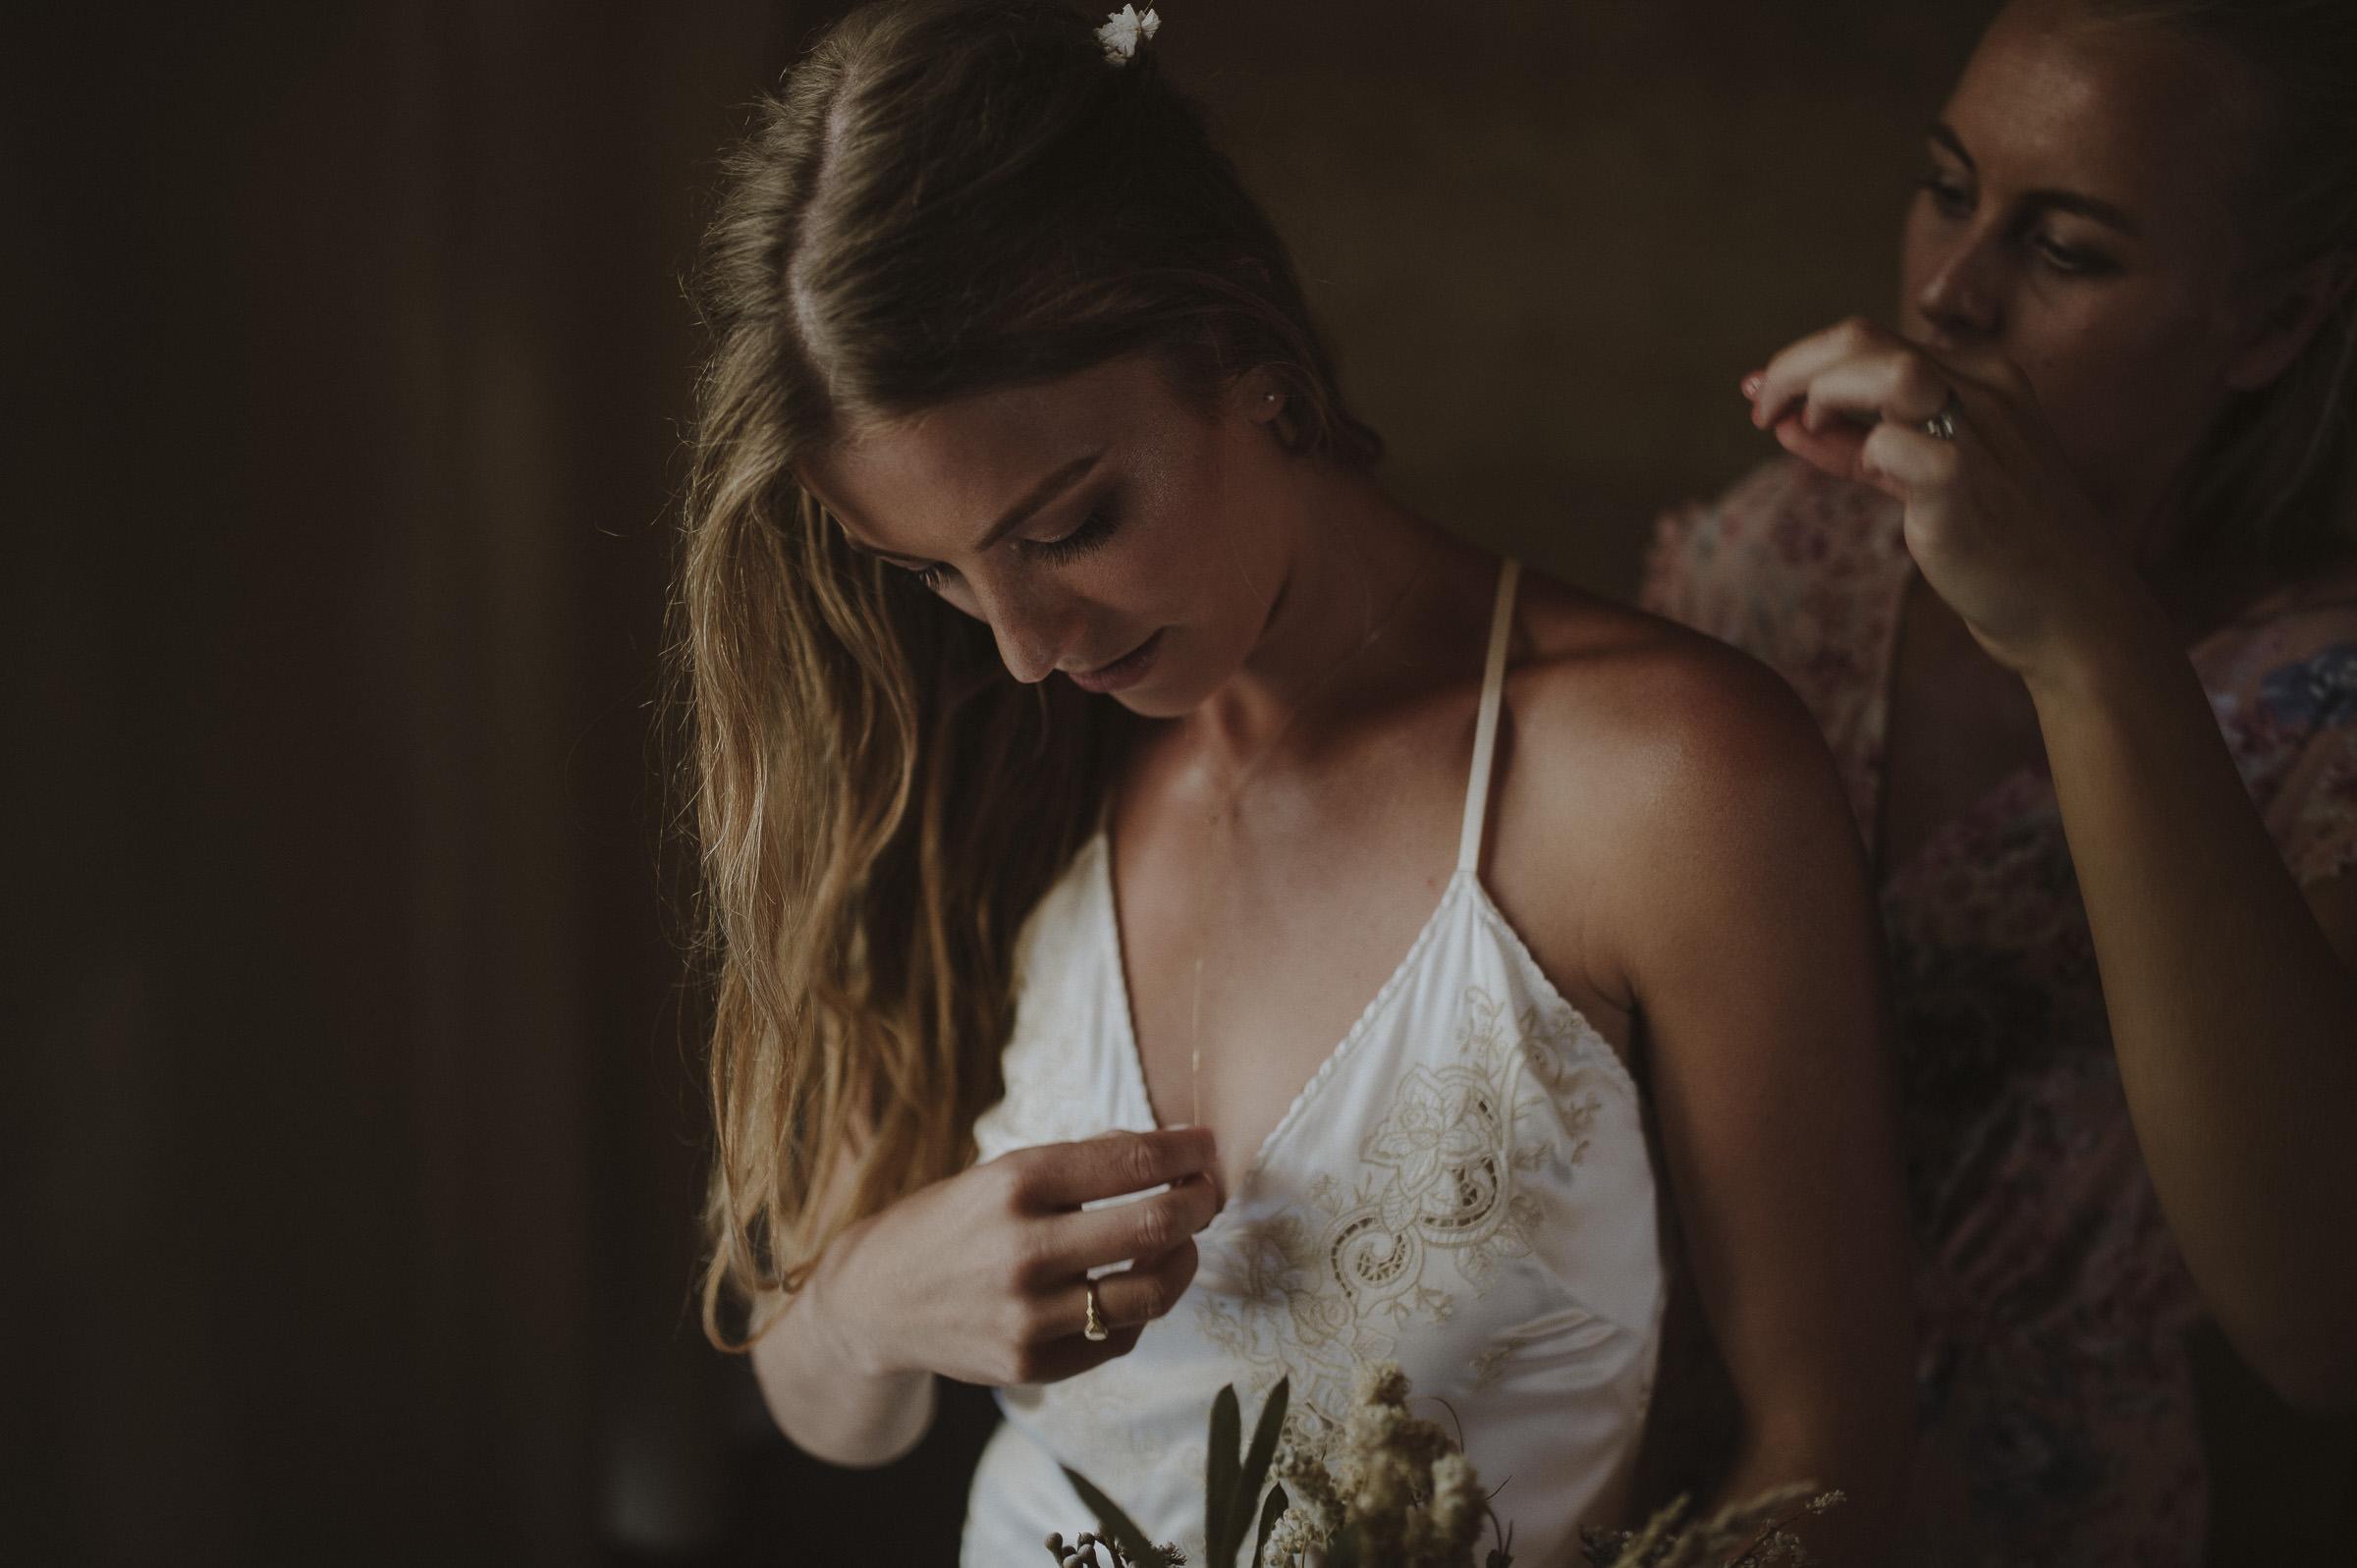 Jack_Millie_Seal_Rocks_Wedding_Photographer_Blog-24.jpg